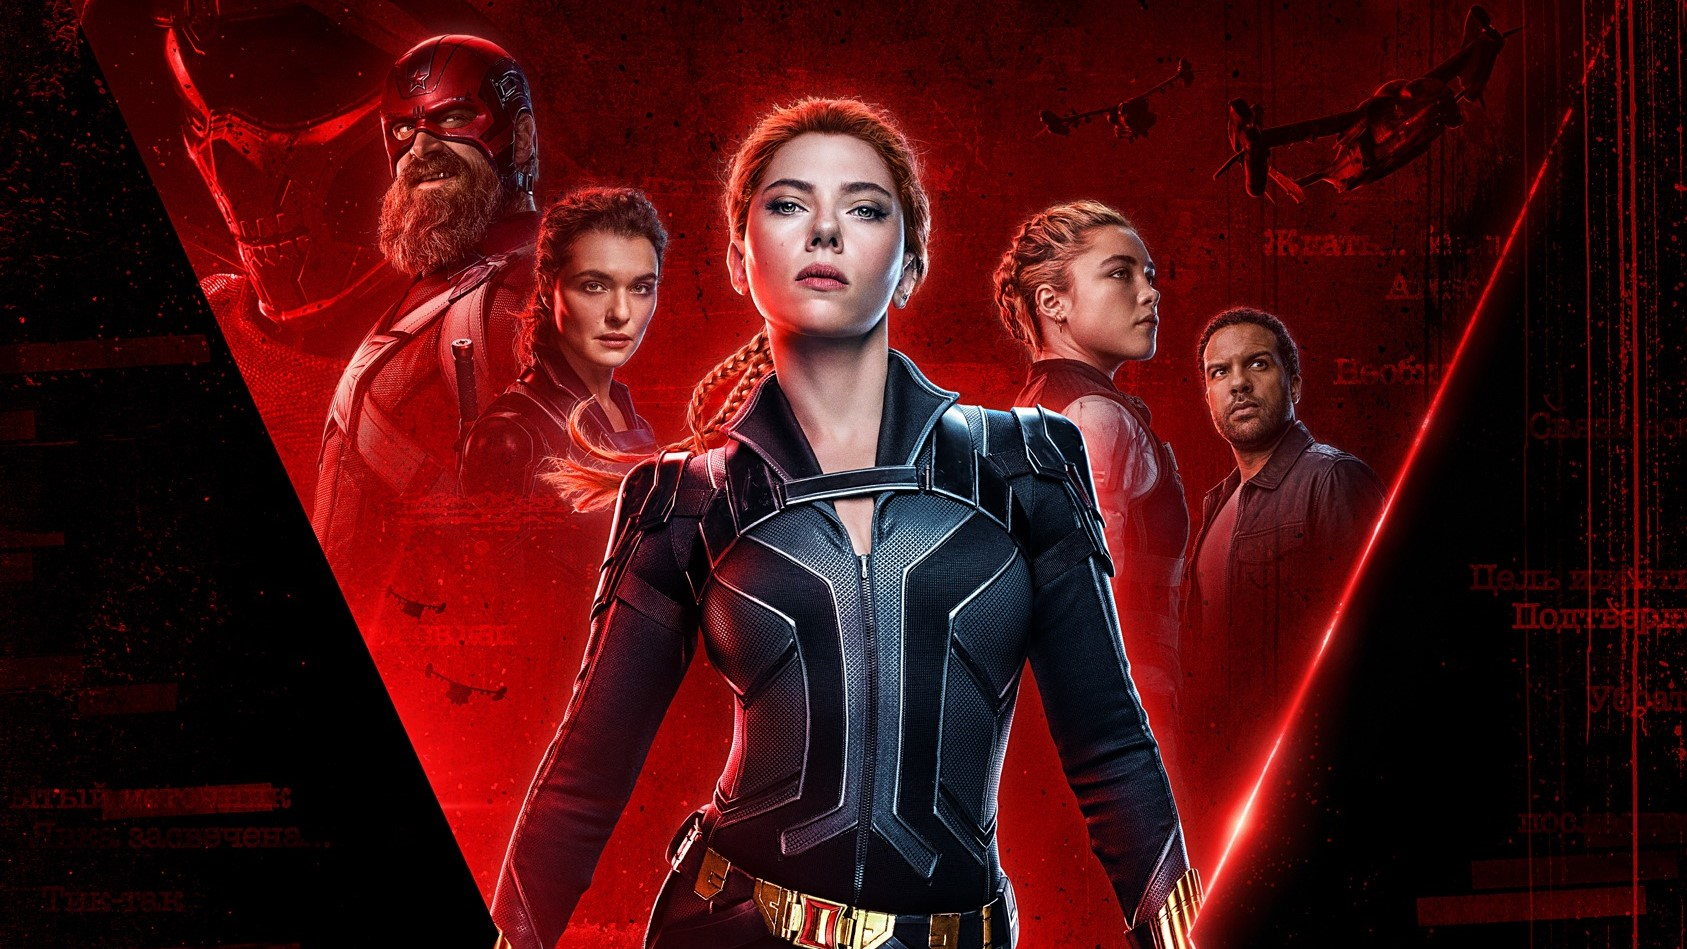 Black Widow Trailer Reaches 70 Million Views in 24hrs